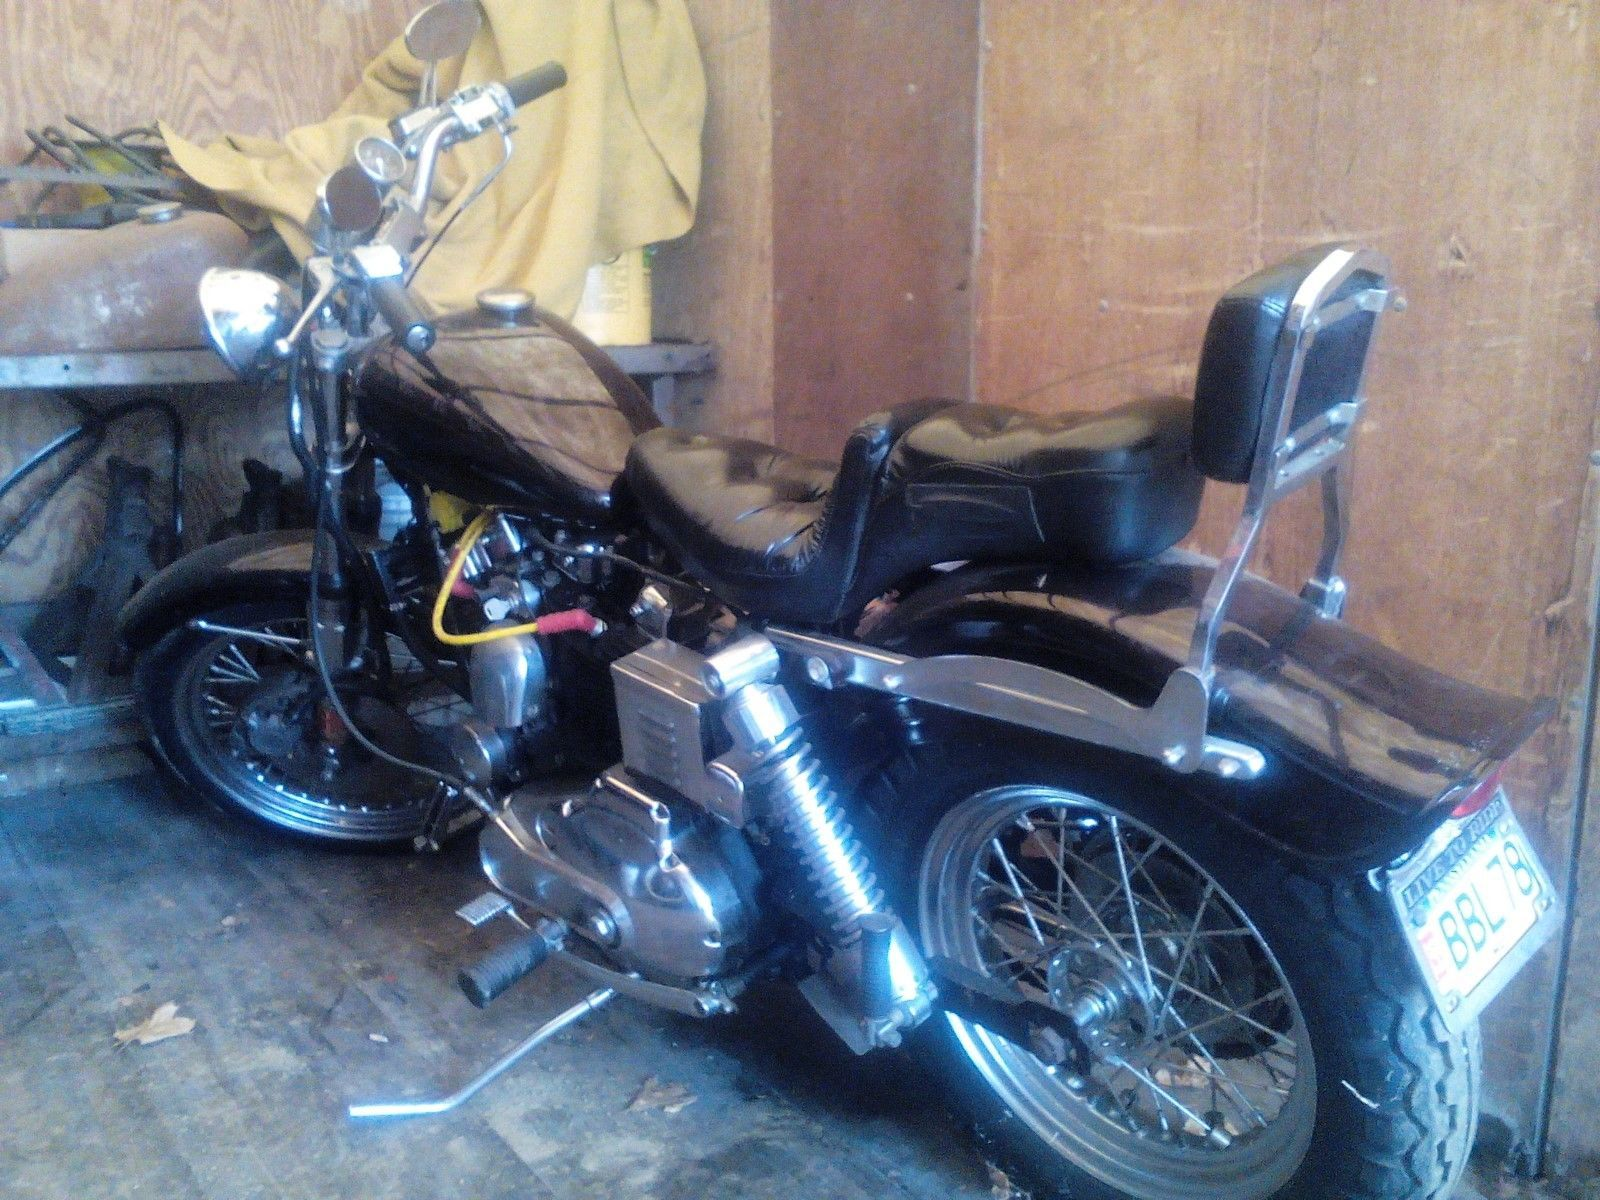 eBay: 1973 Harley-Davidson Sportster 1973 Harley-Davidson Sportster plus extra parts #harleydavidson